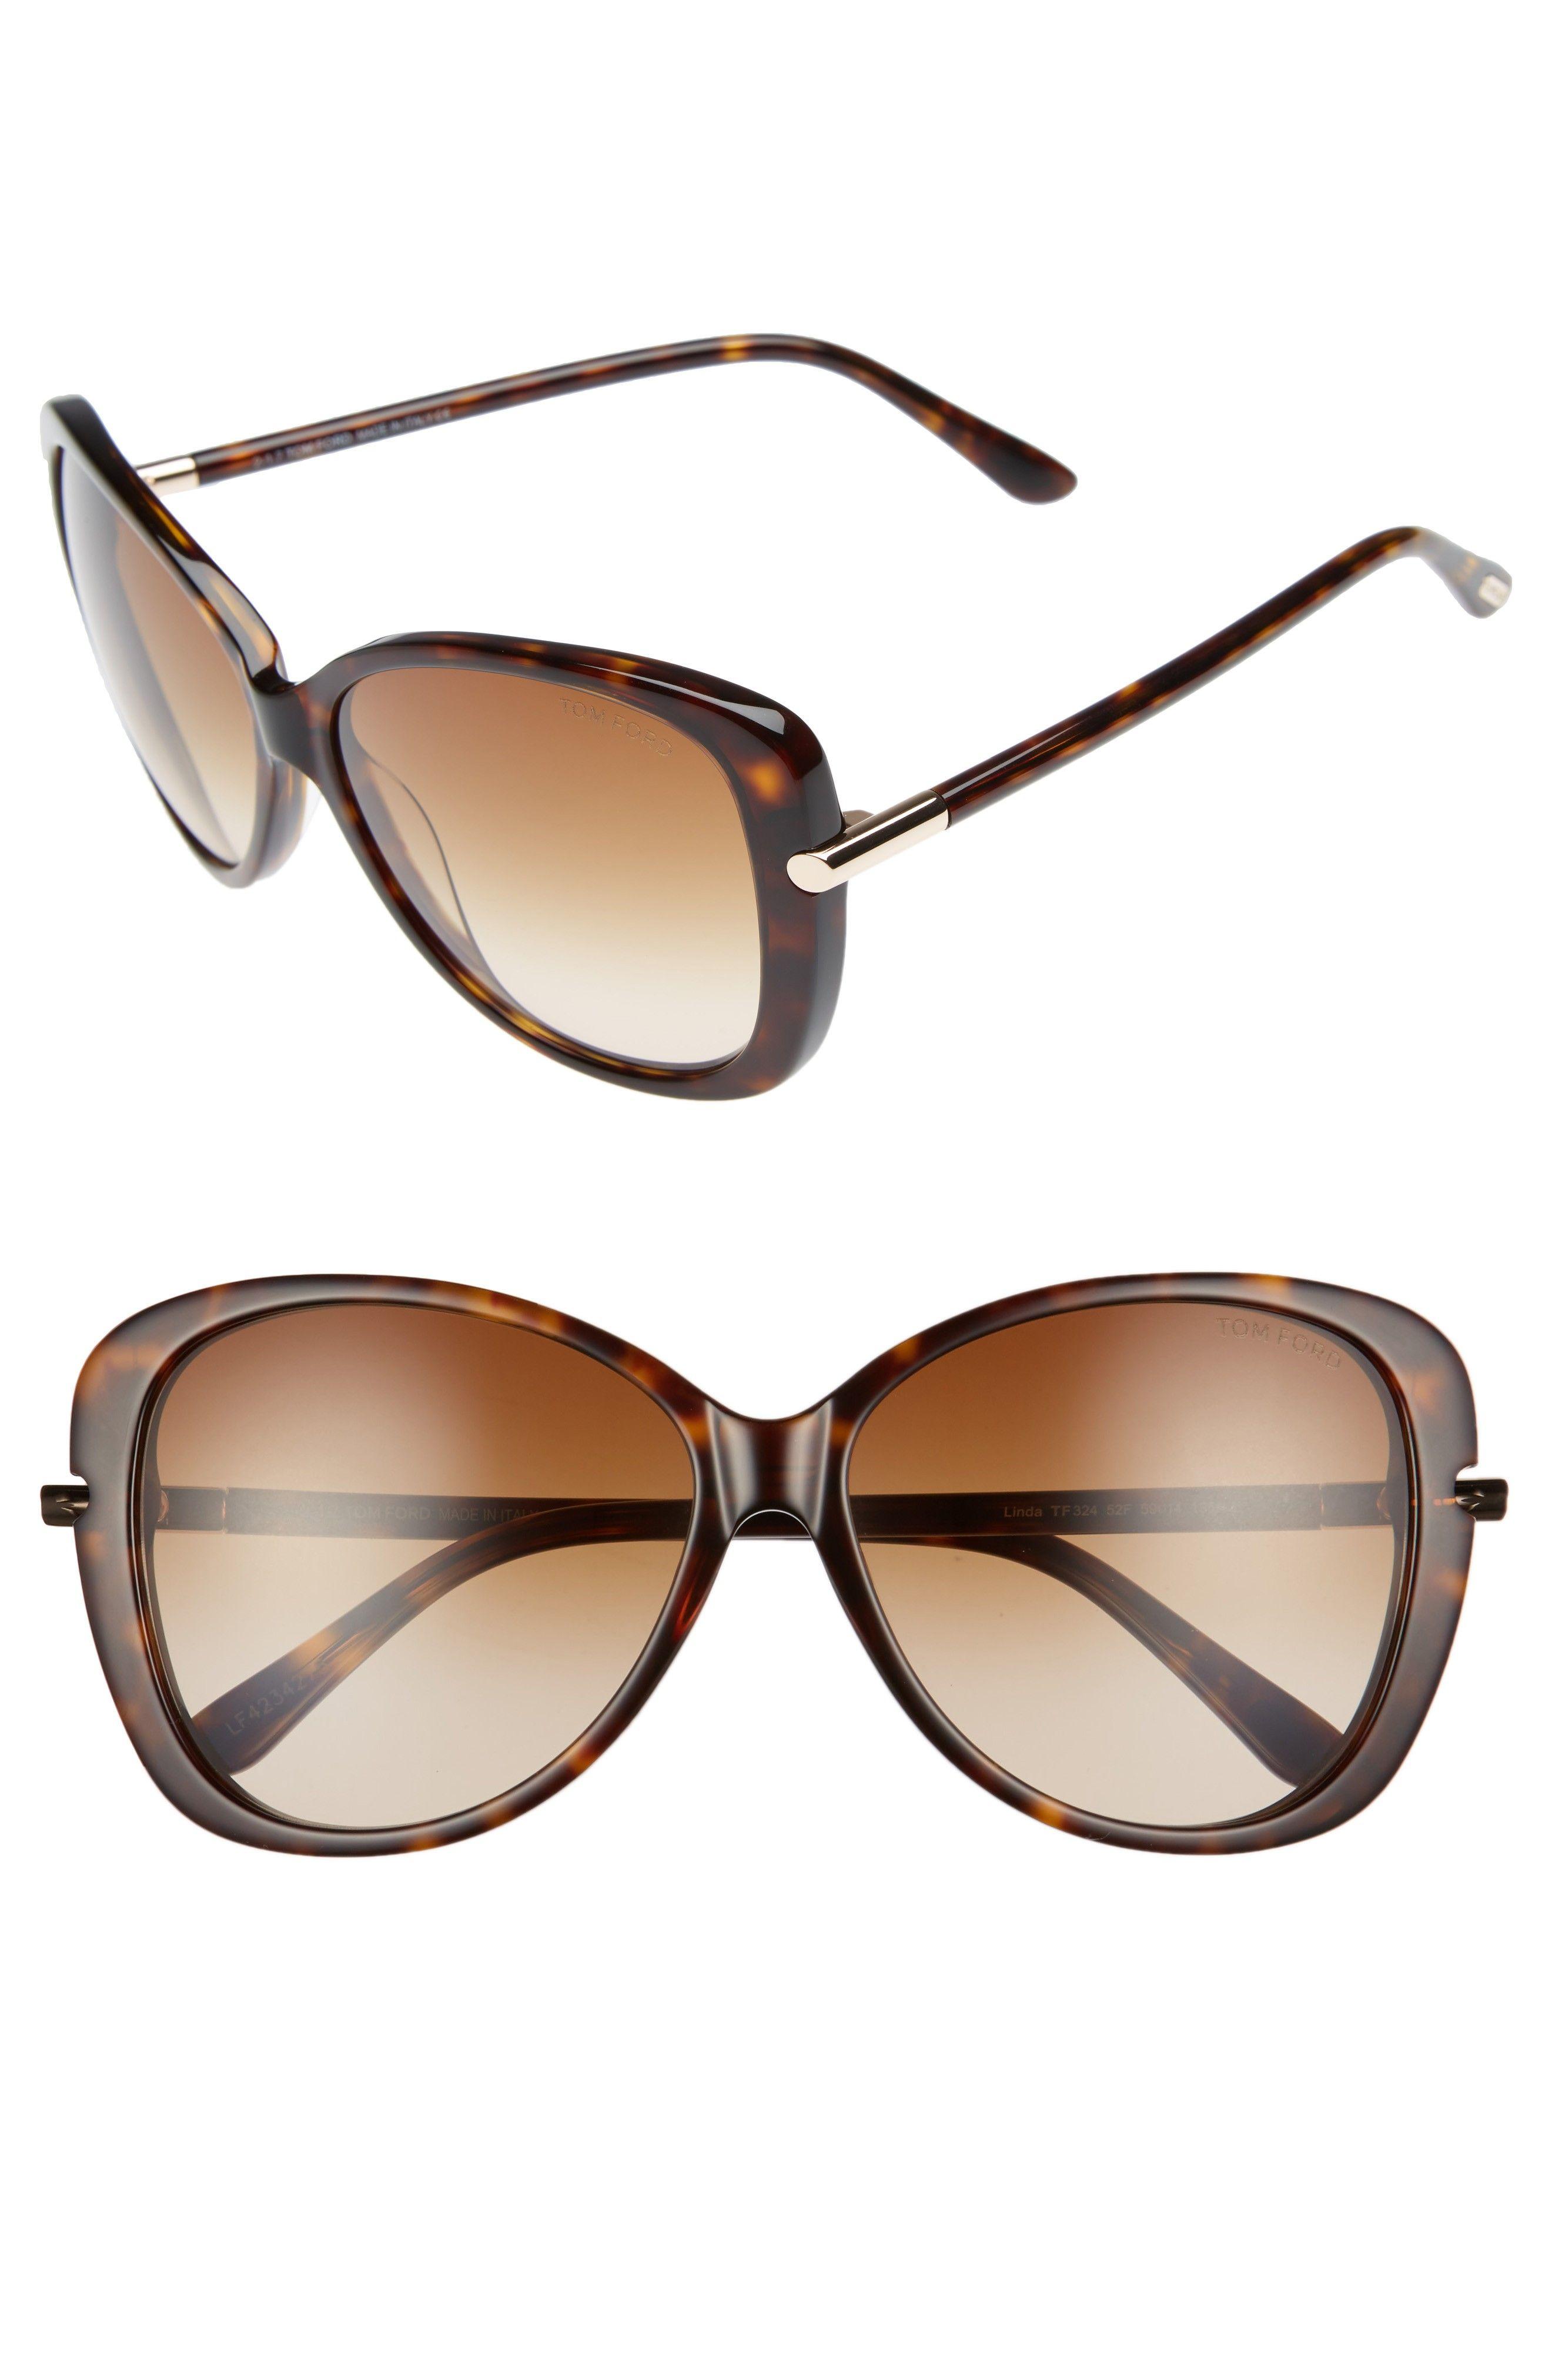 0f0da6b274 Tom Ford Linda 59mm Gradient Butterfly Sunglasses Nordstrom Anniversary  Sale 2017